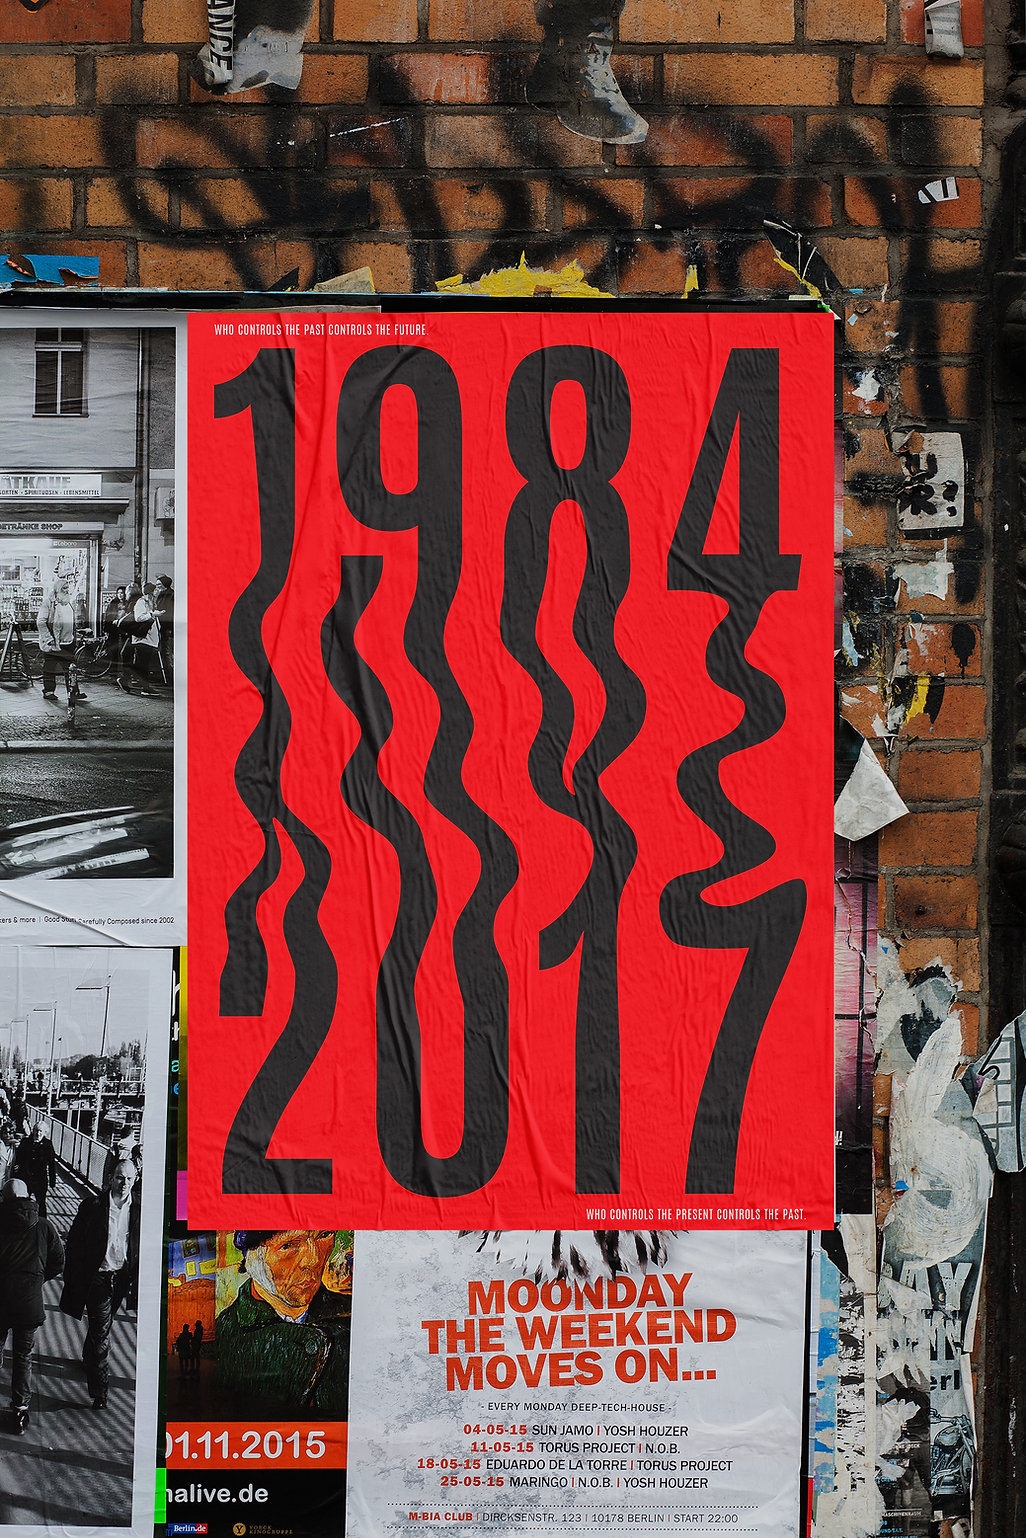 1984Poster_presentation5.jpg